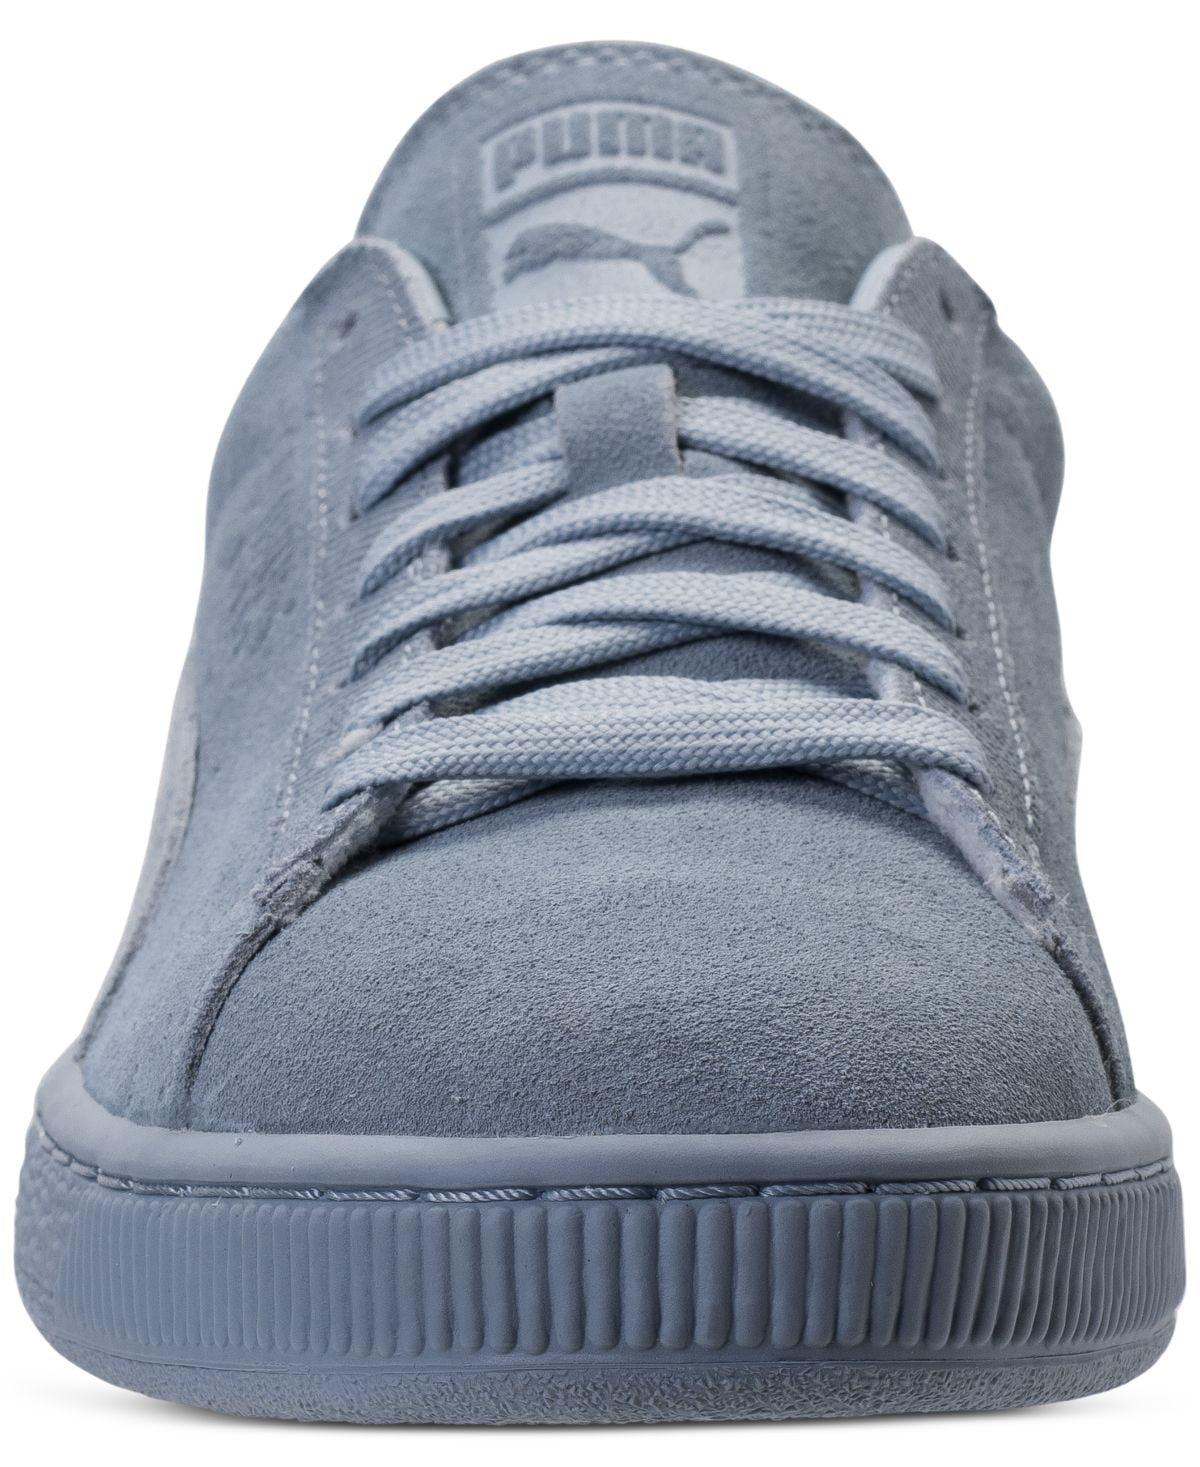 Puma Men's Suede Classic Tonal Blue Fog Ankle-High Fashion Sneaker - 13M